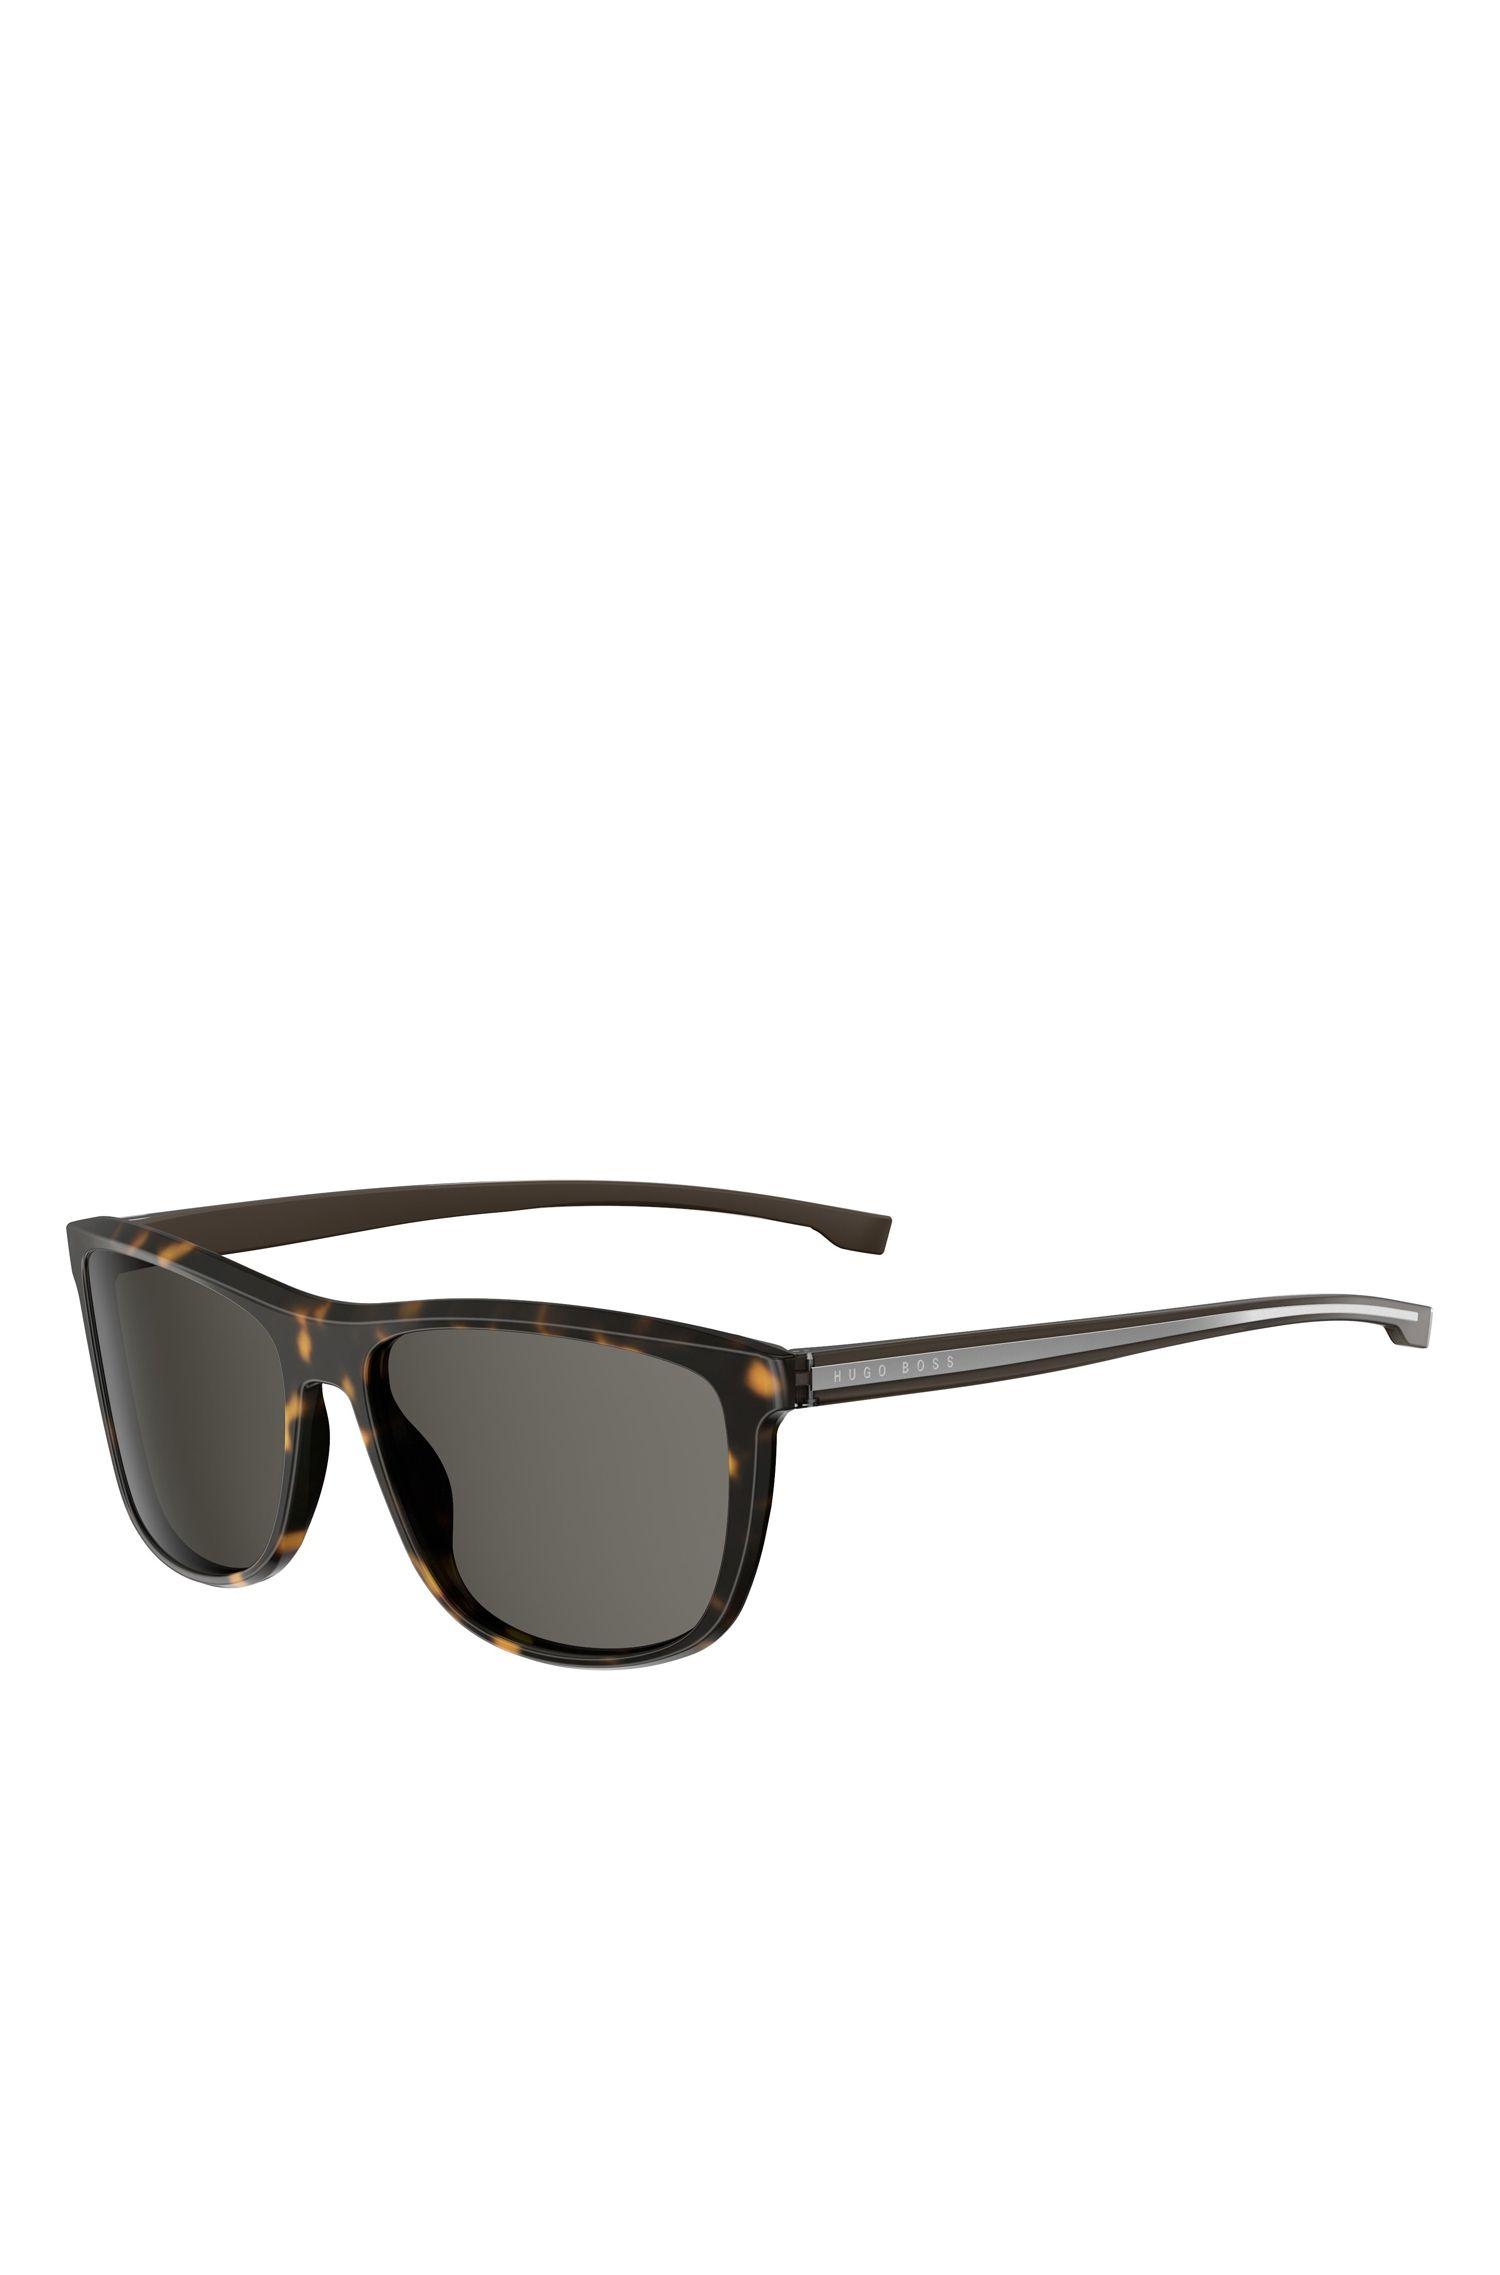 Black Lens Top Bar Sunglasses | BOSS 0874S